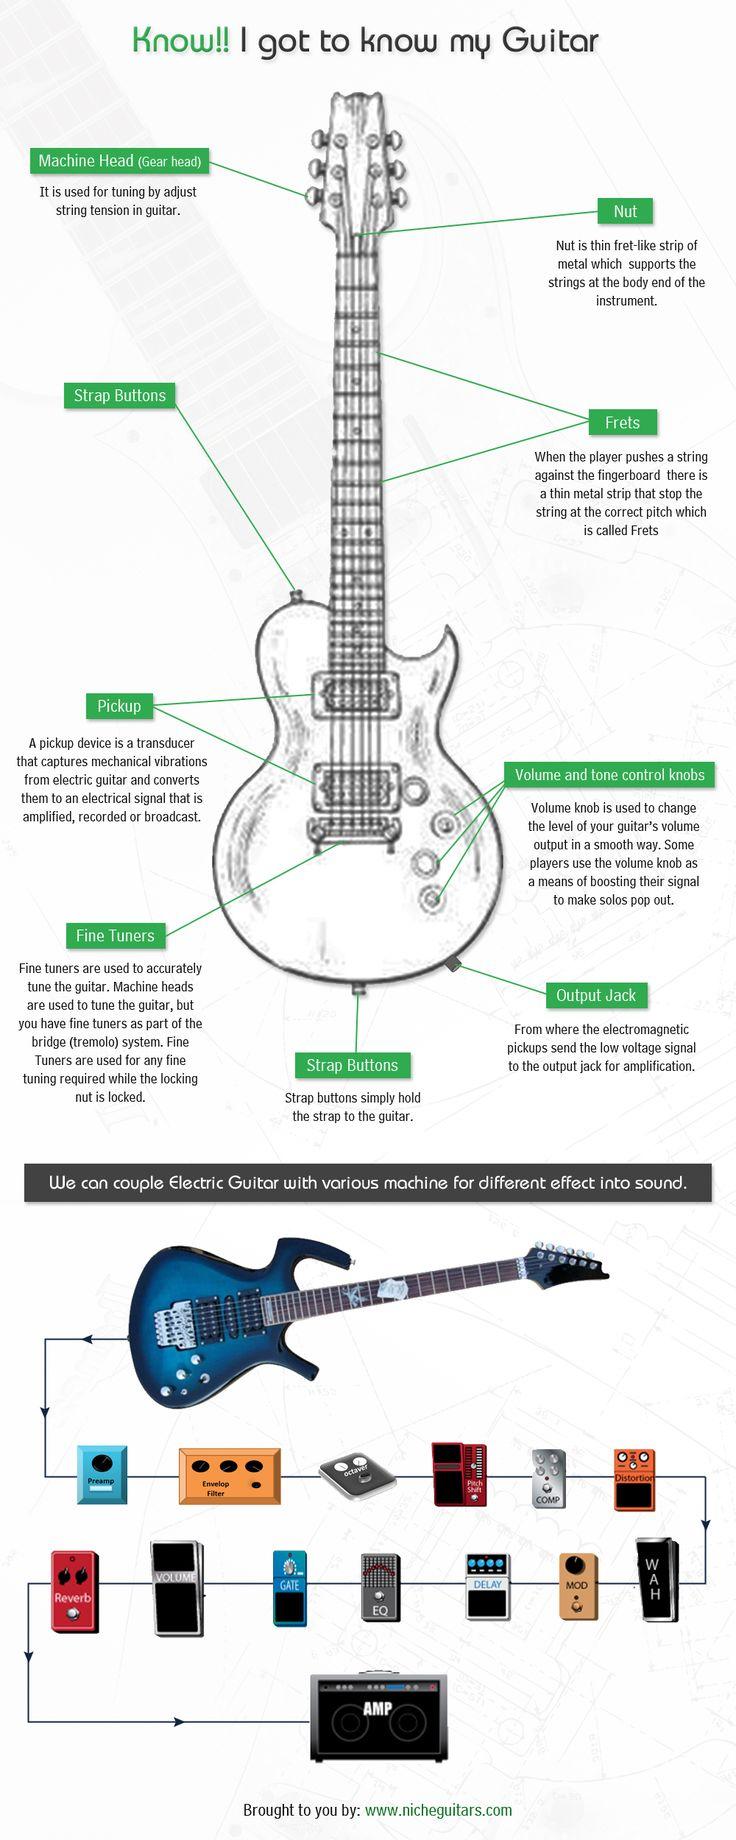 25+ best ideas about Electric Guitar Parts on Pinterest | Guitar ...